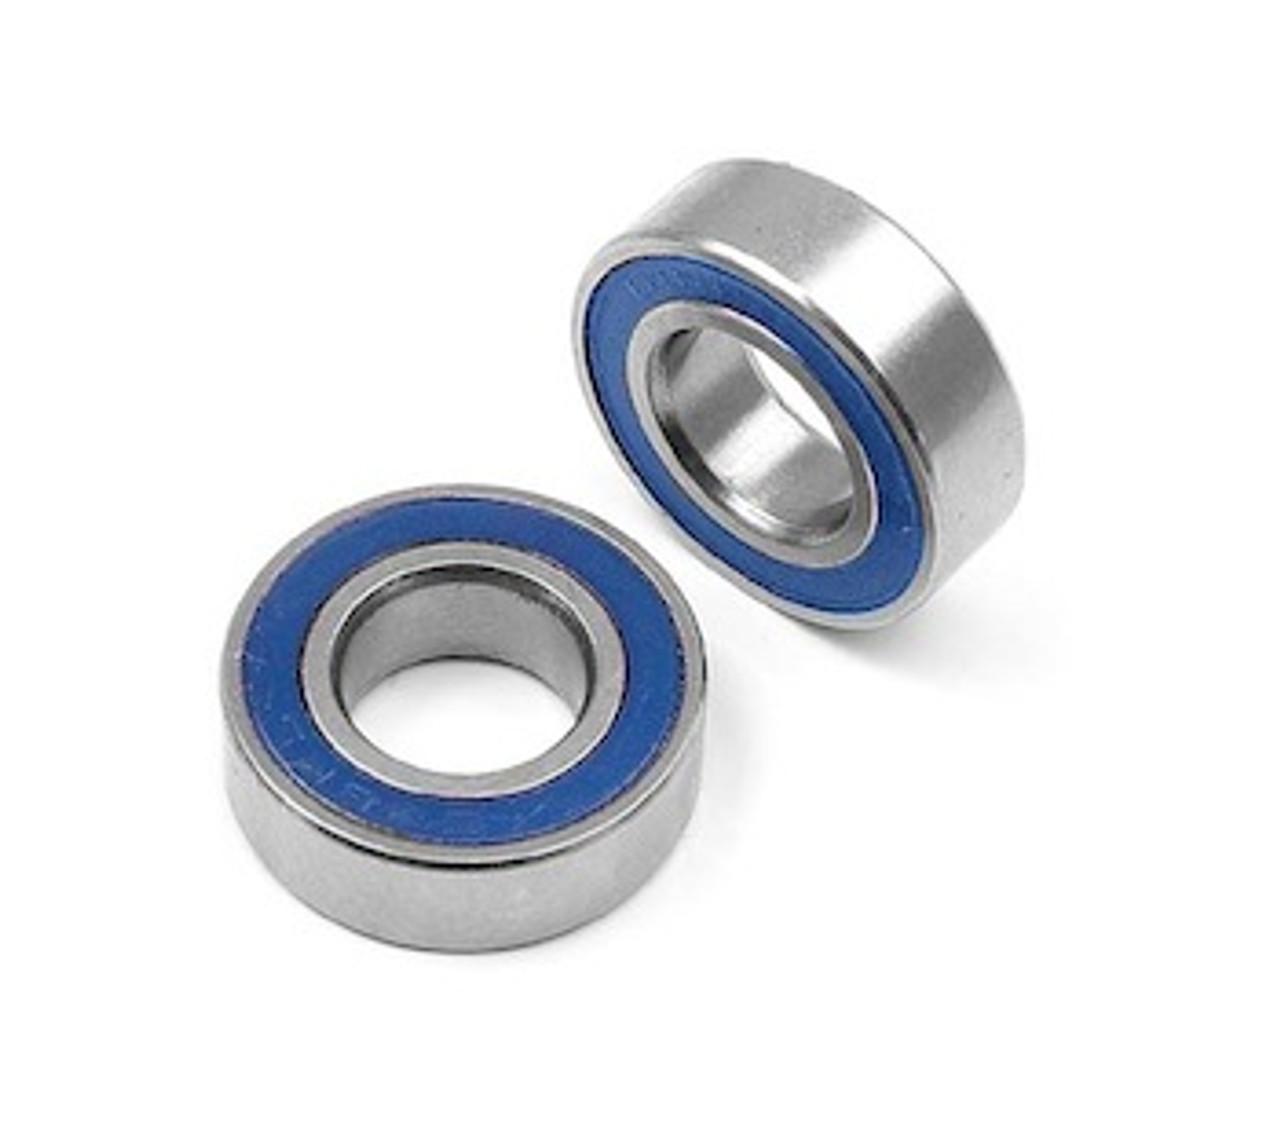 Bearings Metric Series 4x8x3 MM rubber sealed (2 Pack) (MR84 2RS)